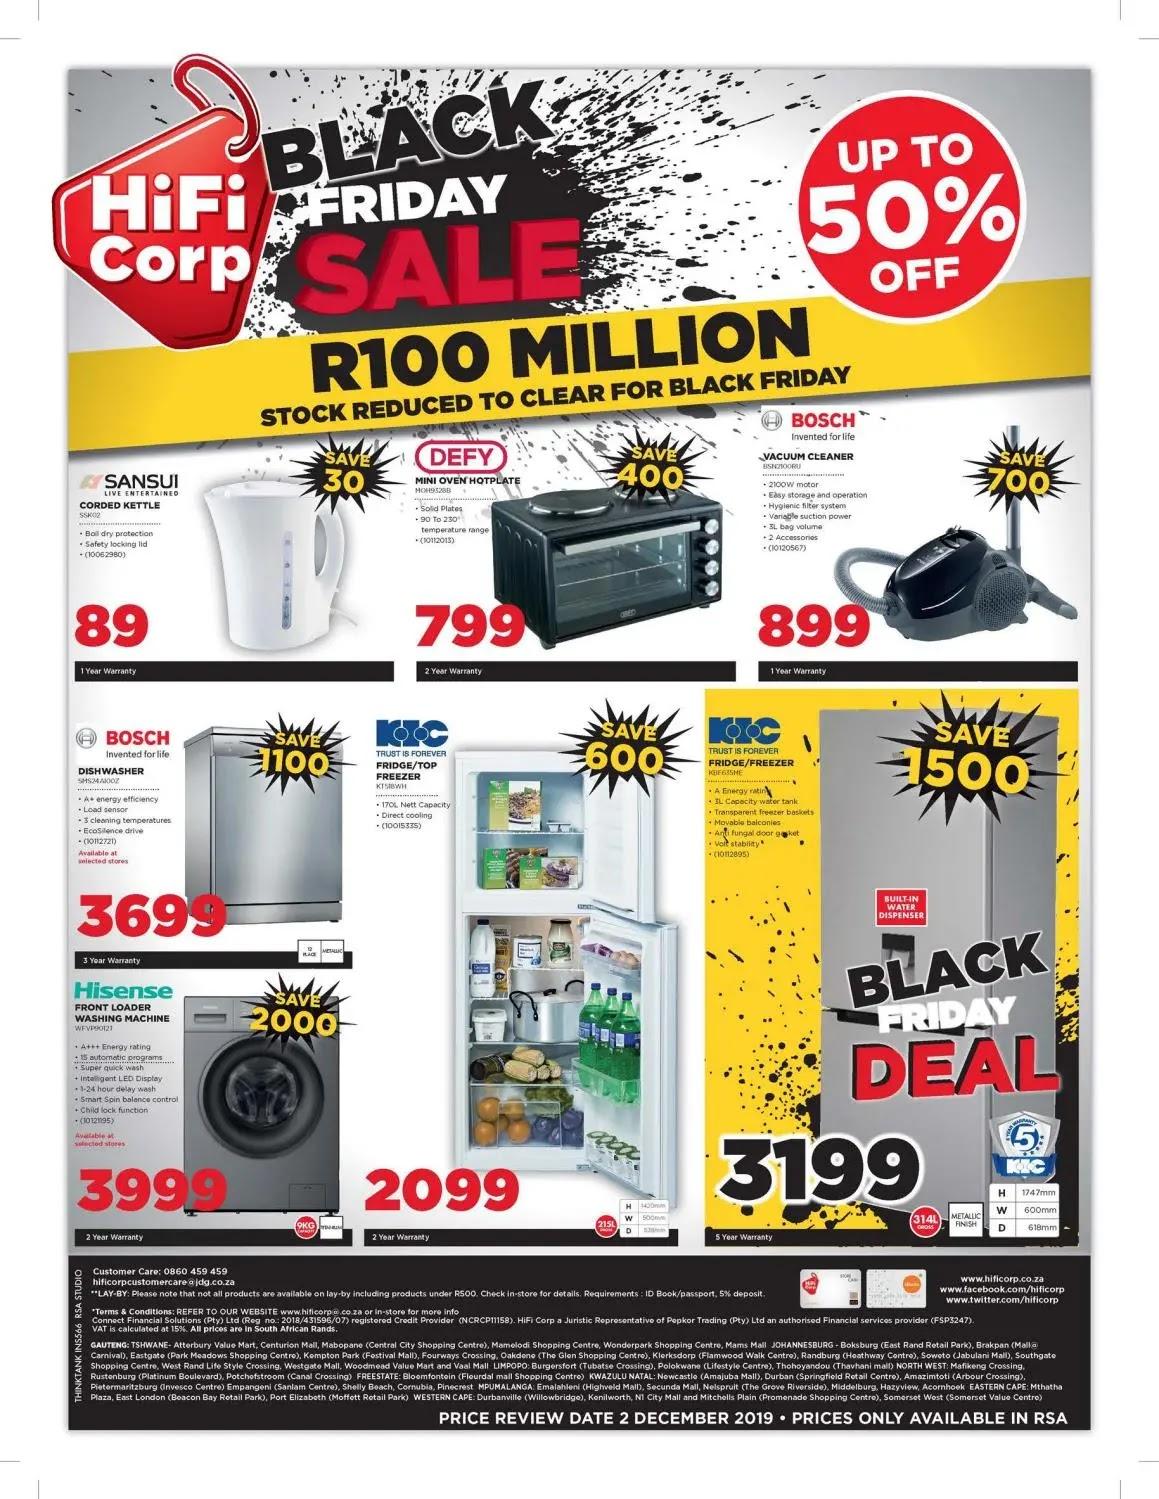 HiFi Corporation Black Friday Deals  Page 12